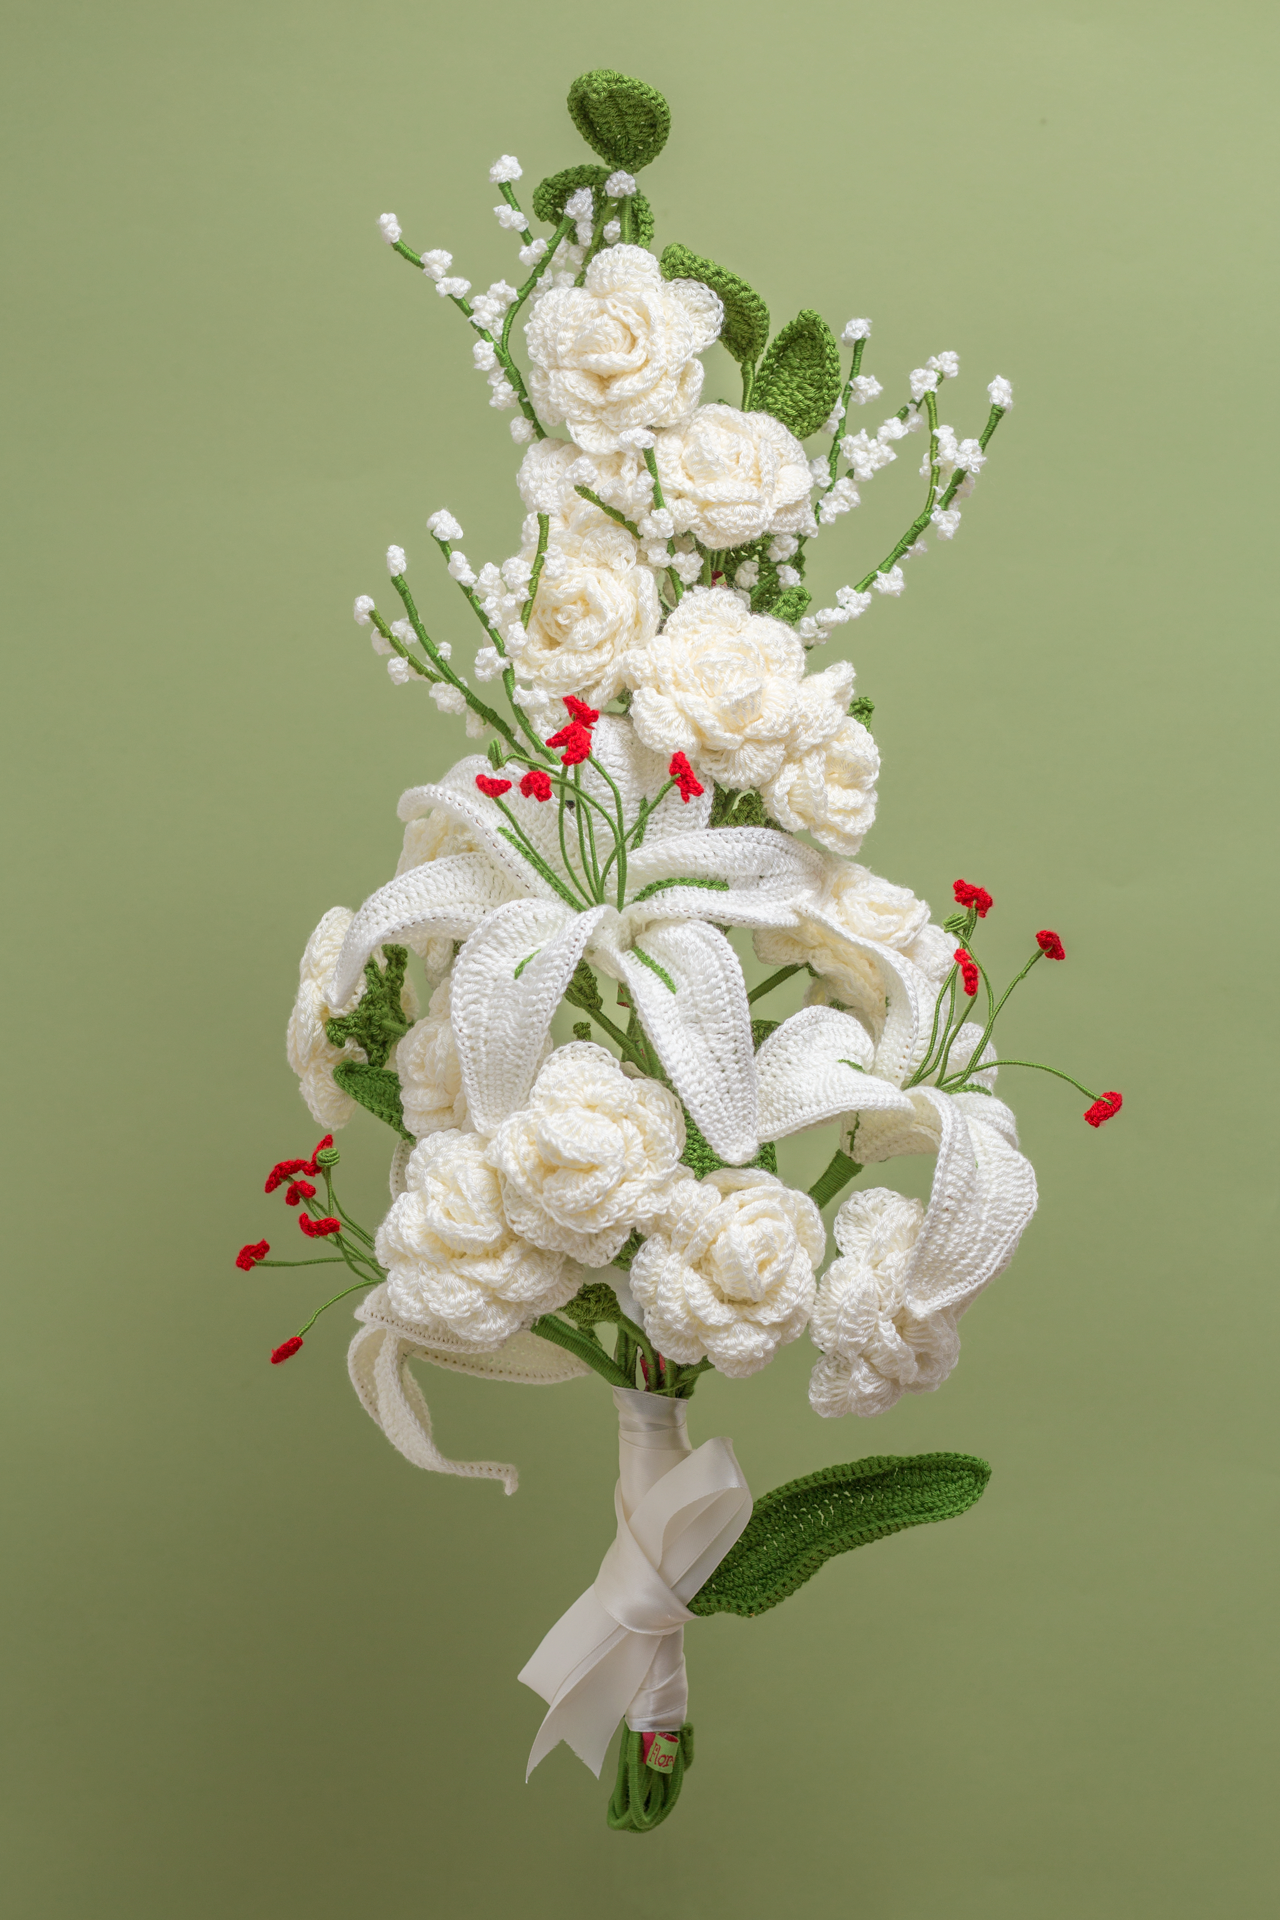 Roses, Lilies & Gypsophilas (+ greenery)